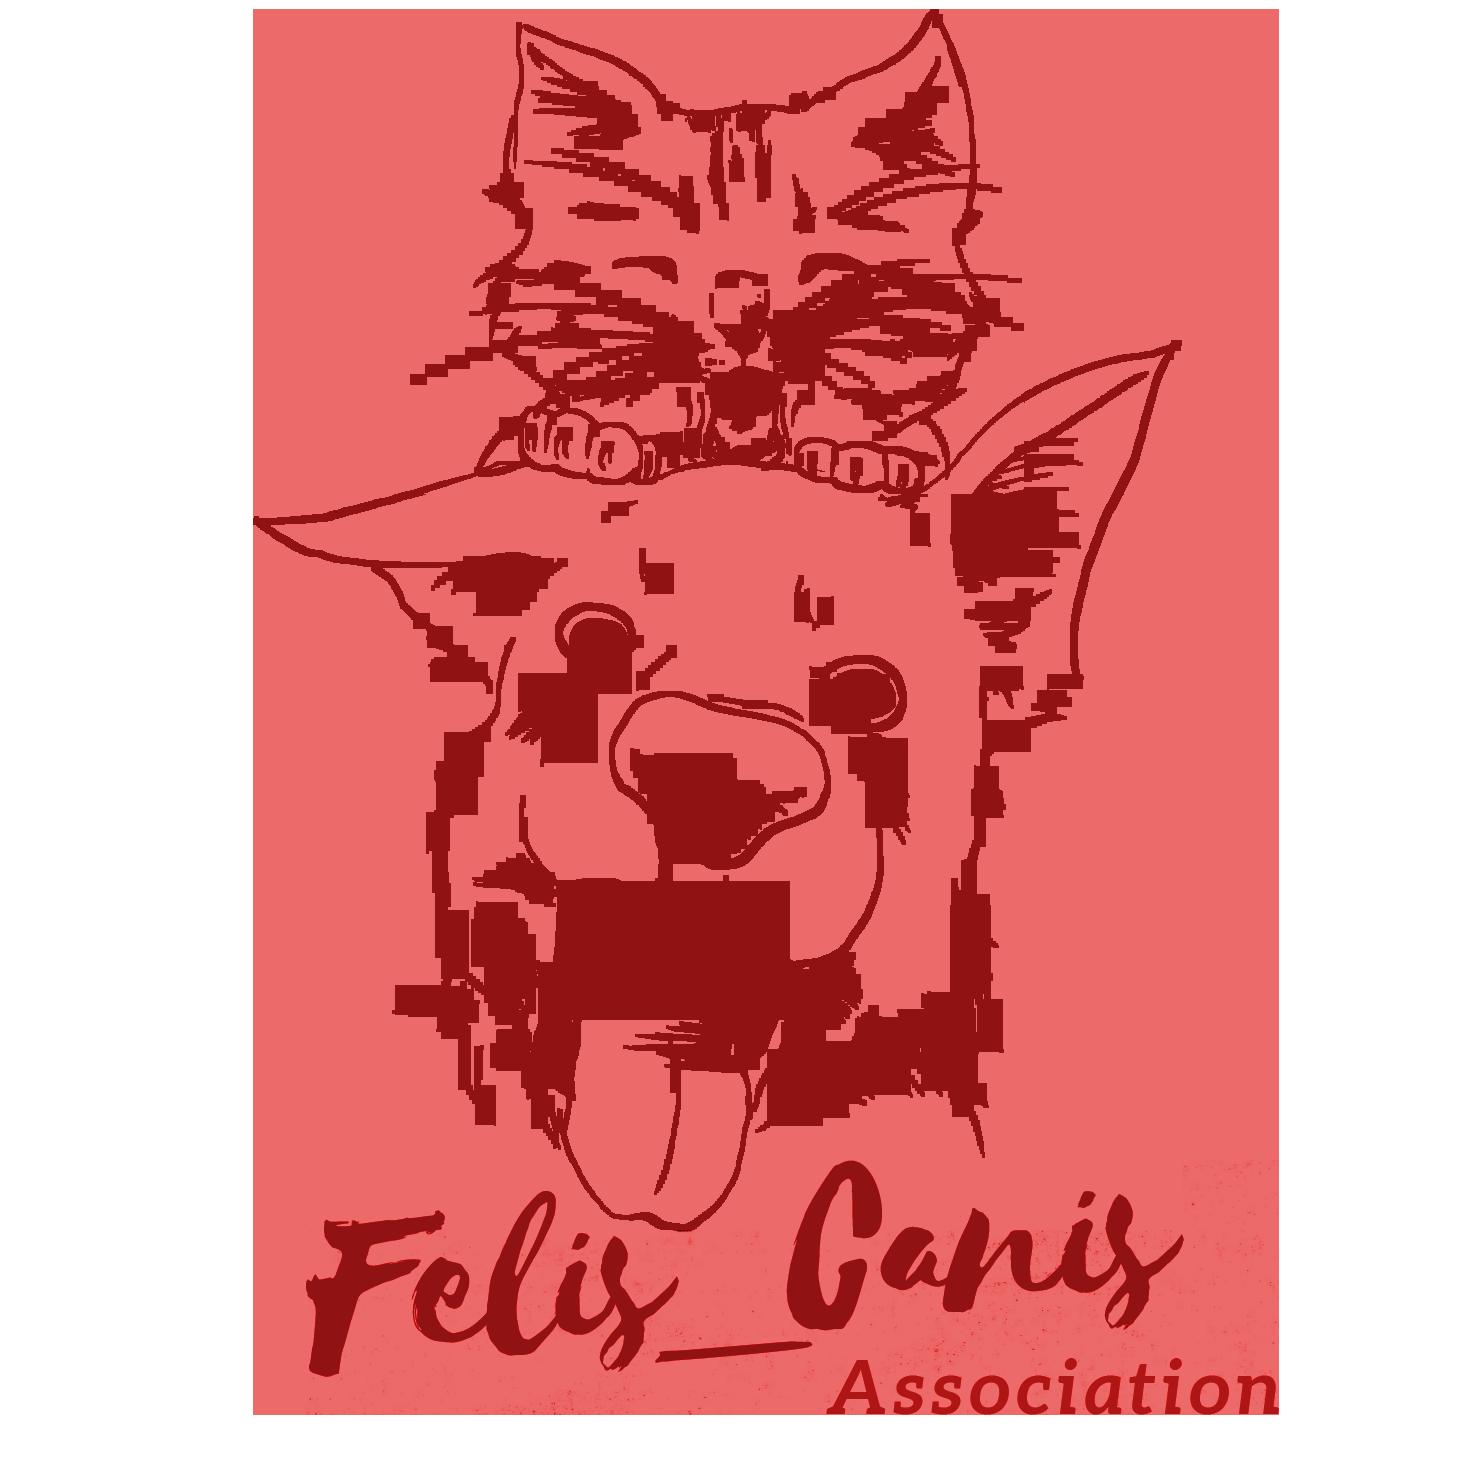 Felis_Canis Association